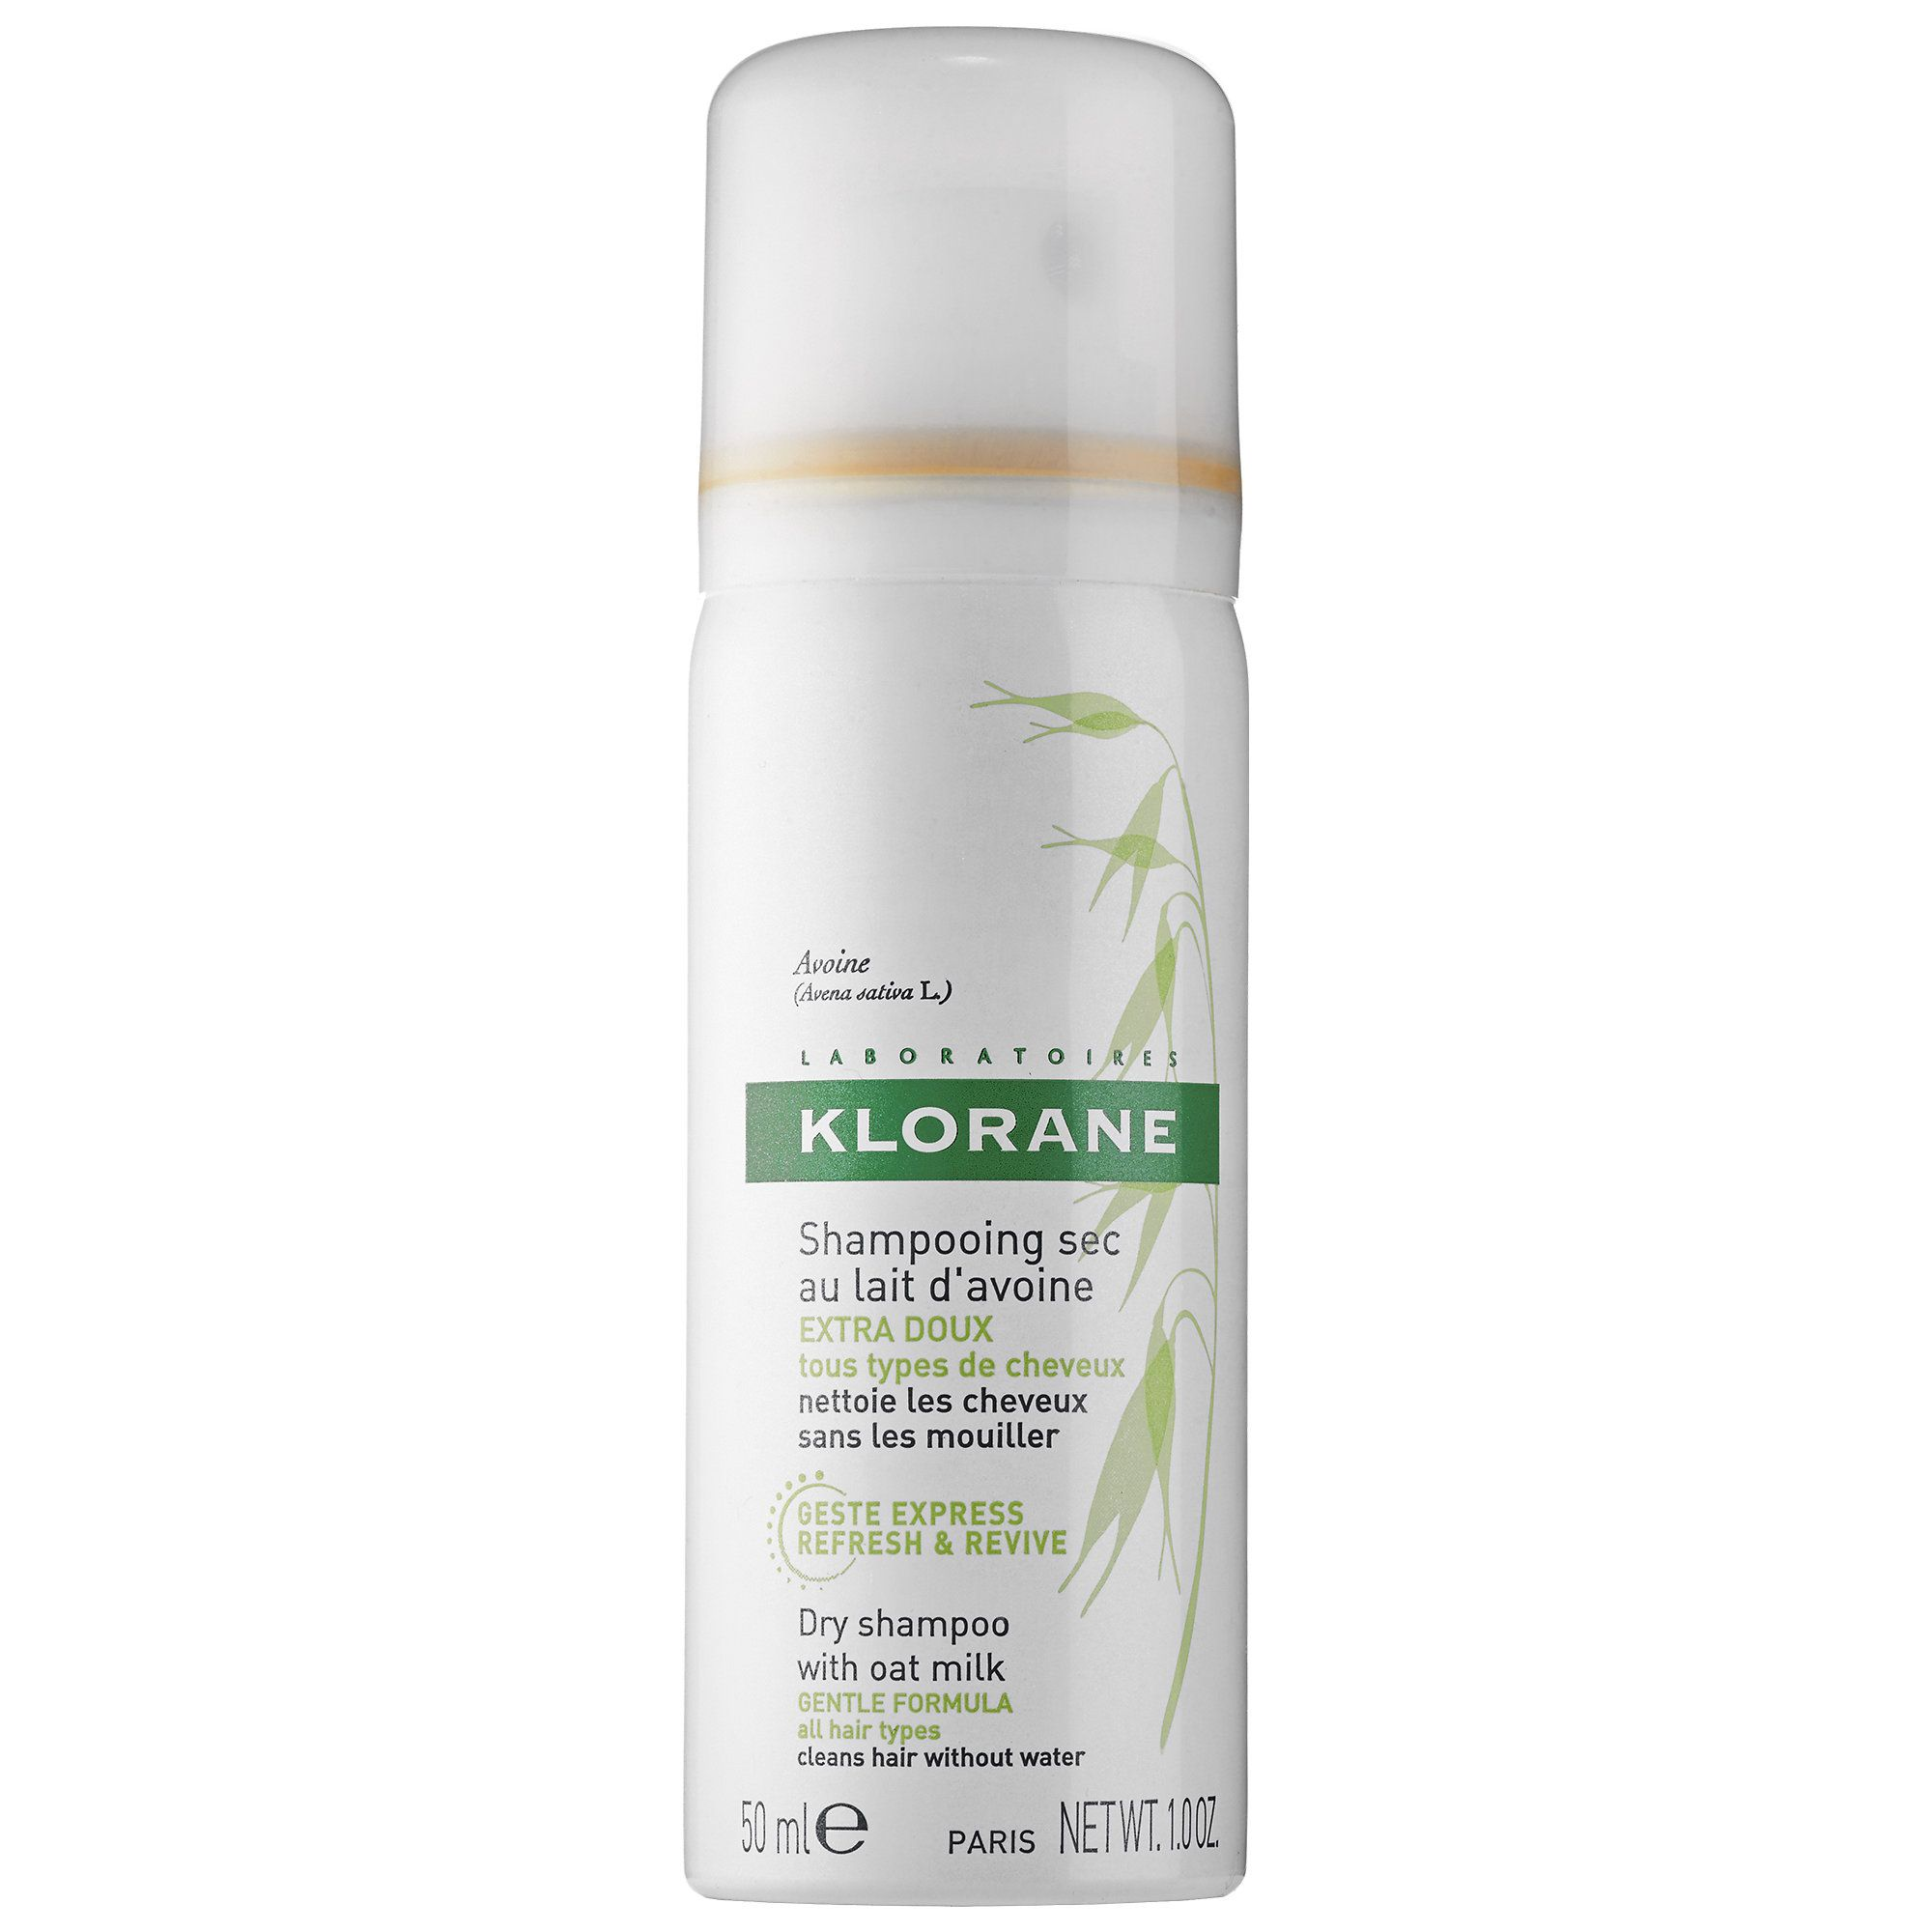 Klorane Dry Shampoo with Oat Milk hair products Pinterest Sephora